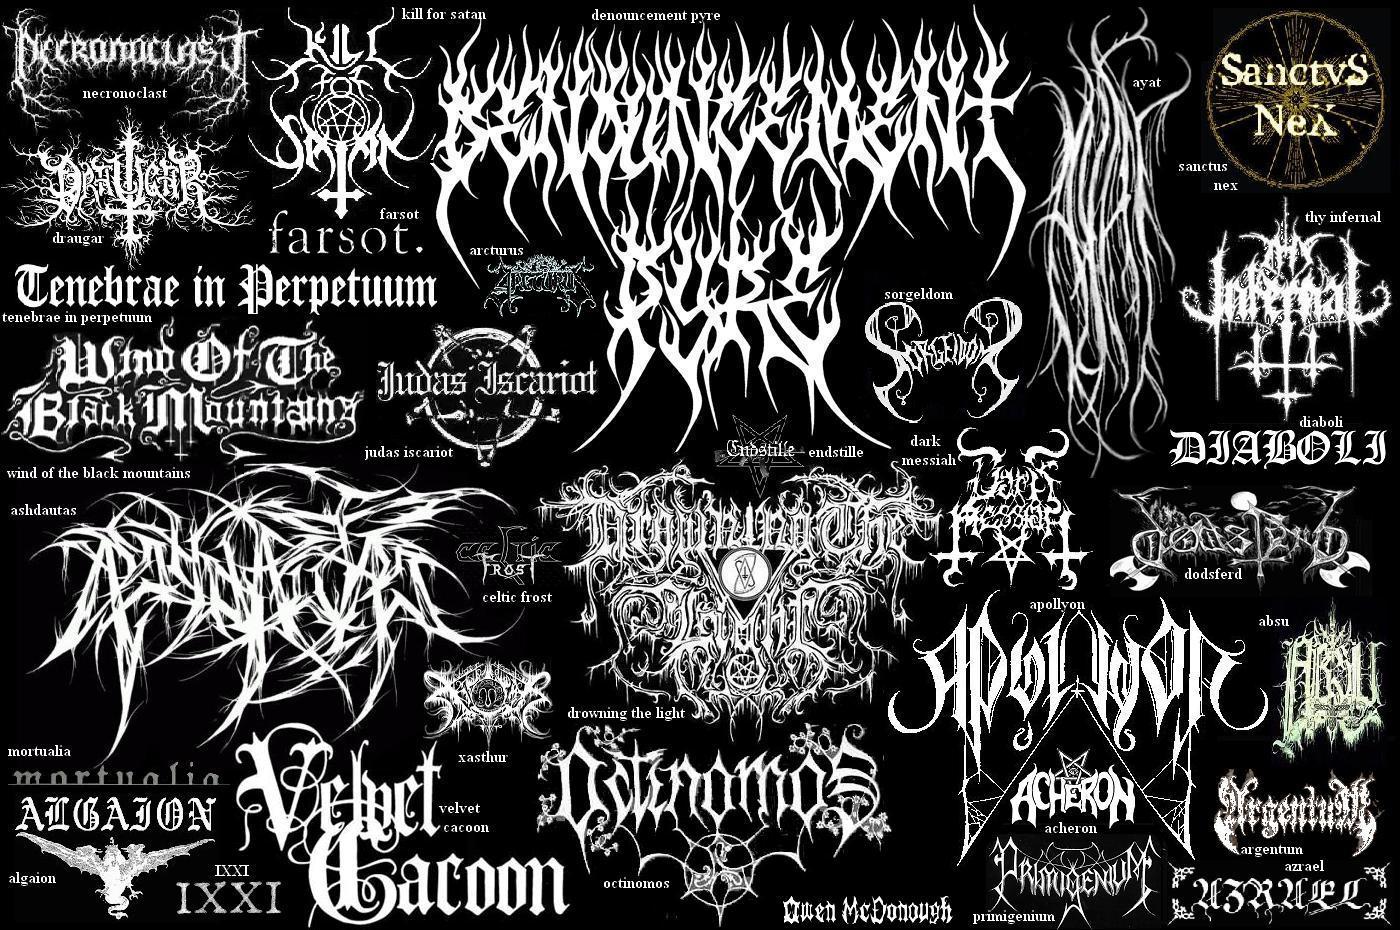 illegible black metal logo - photo #2